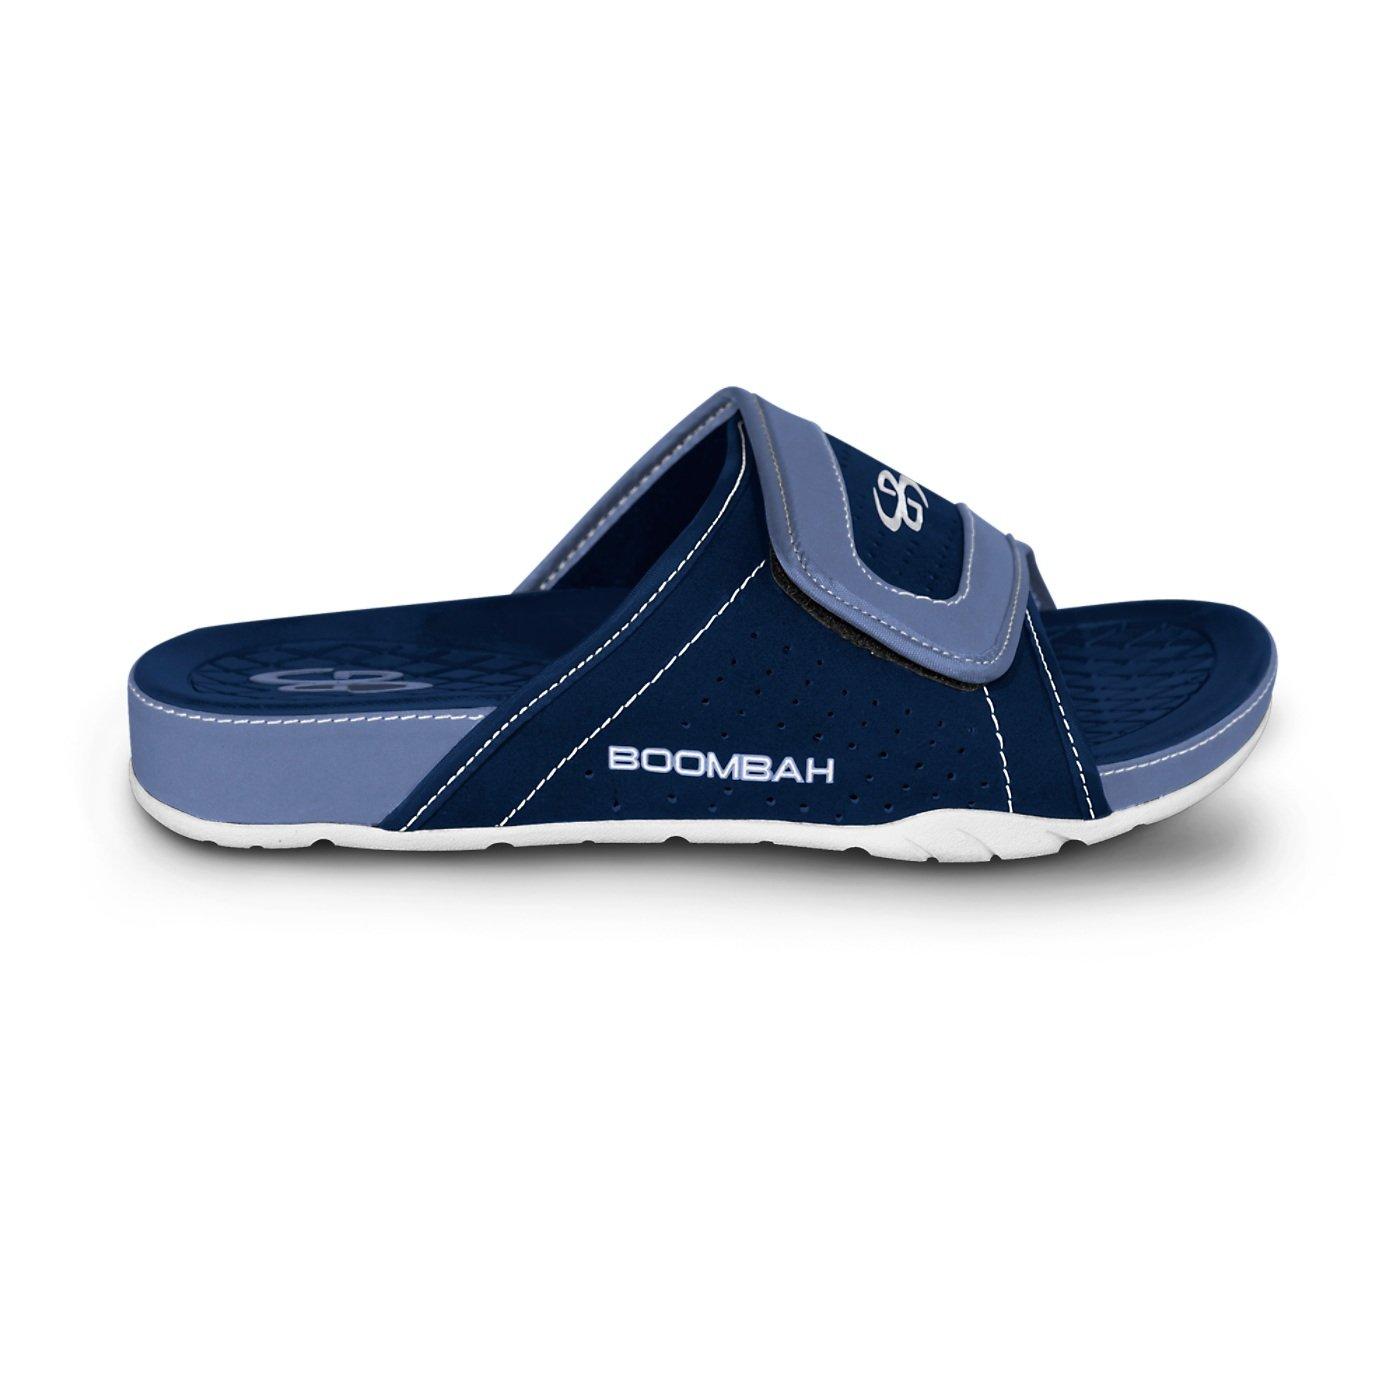 Boombah Men's Tyrant Slide Sandals - 32 Color Options - Multiple Sizes B077NL7V9Q 13|Navy/Columbia